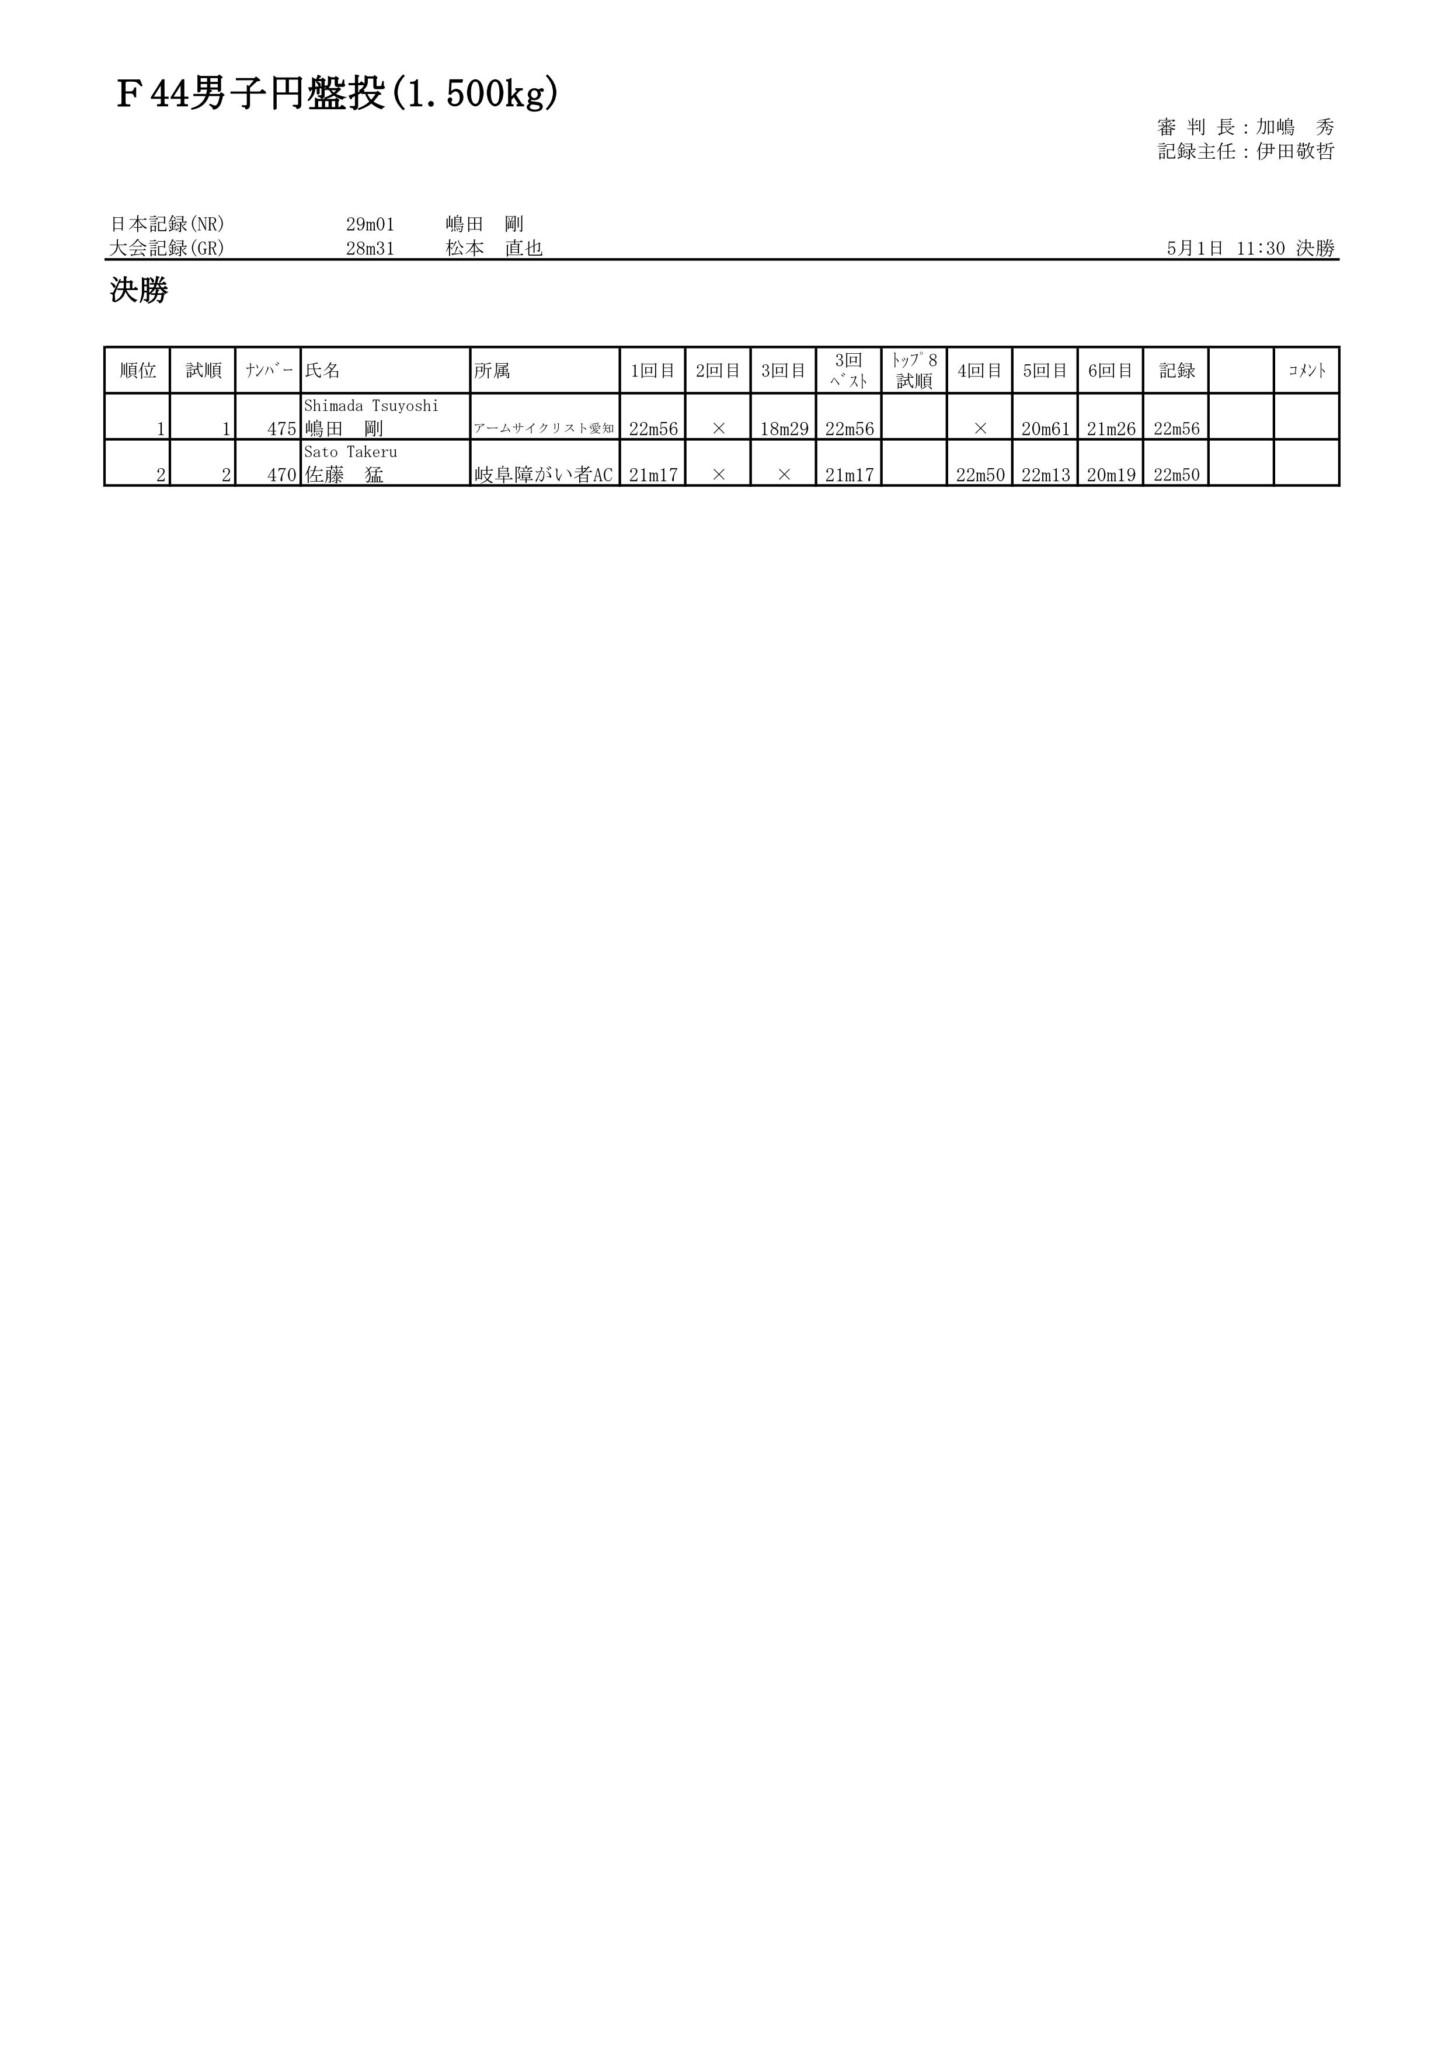 41F44男子円盤投(1.500kg)_01